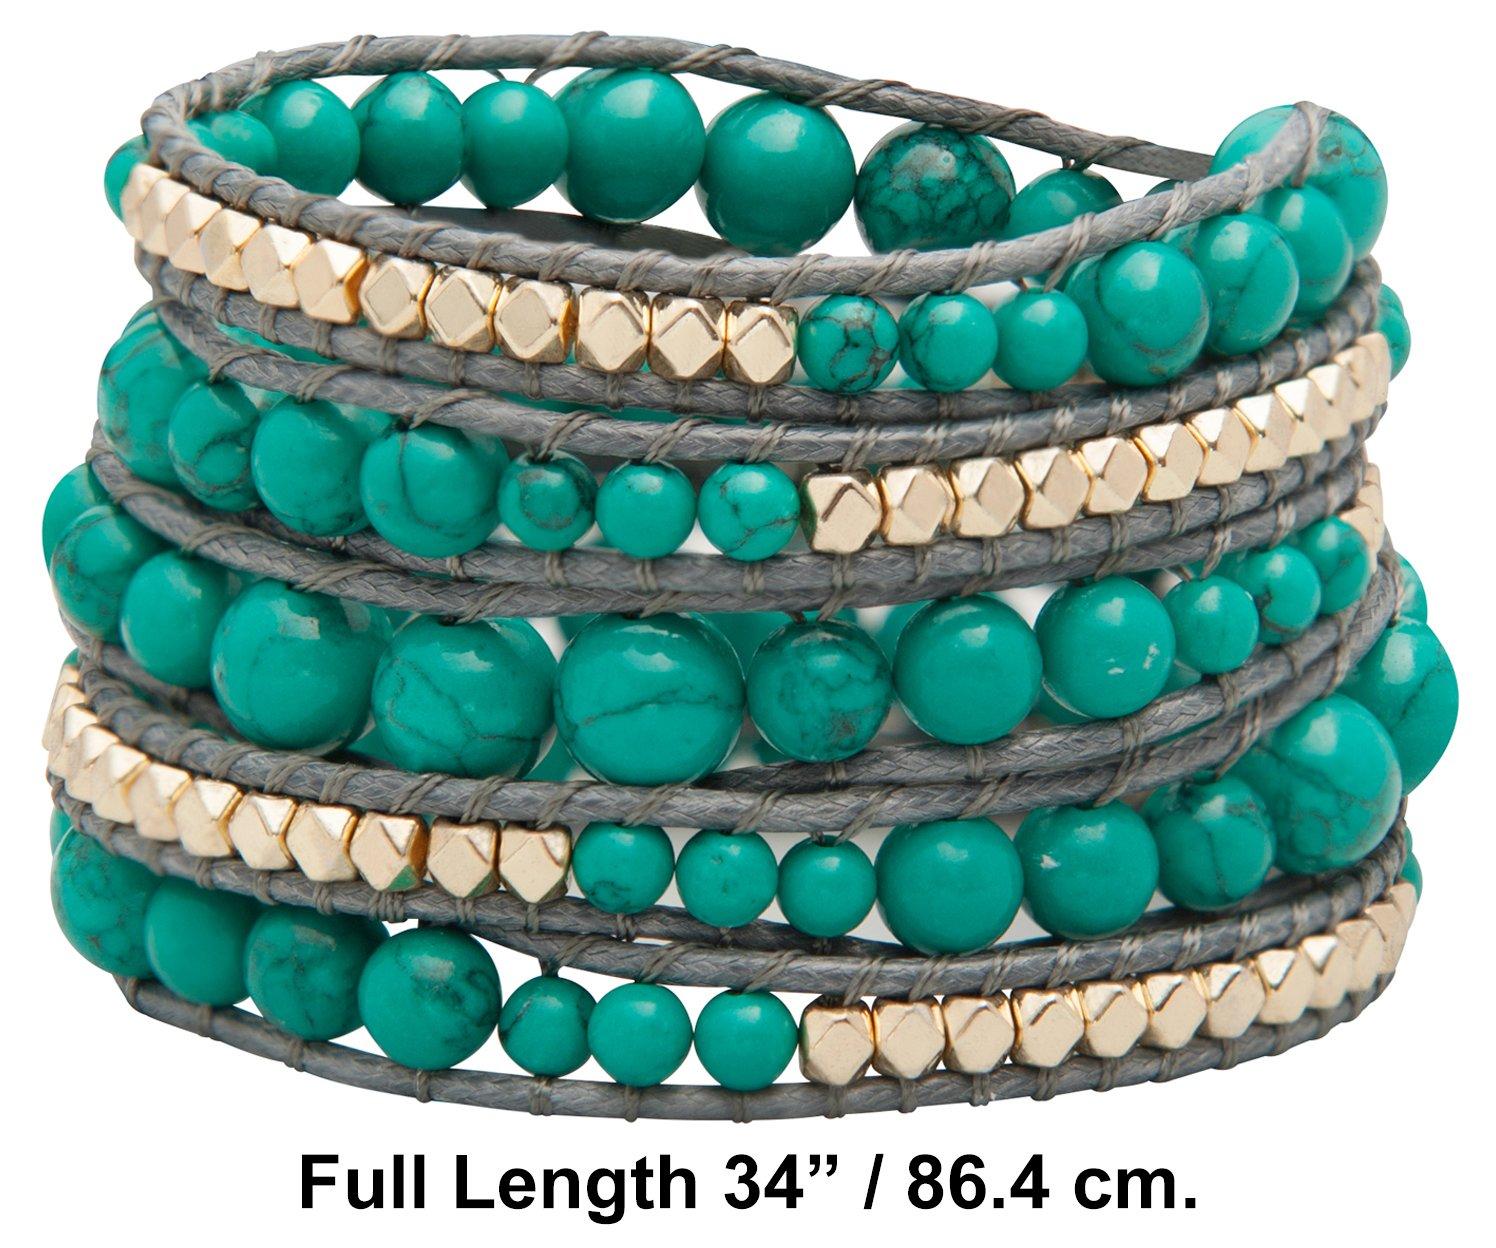 Genuine Stones 5 Wrap Bracelet - Bangle Cuff Rope With Beads - Unisex - Free Size Adjustable (Turquoise) by Sun Life Style (Image #5)